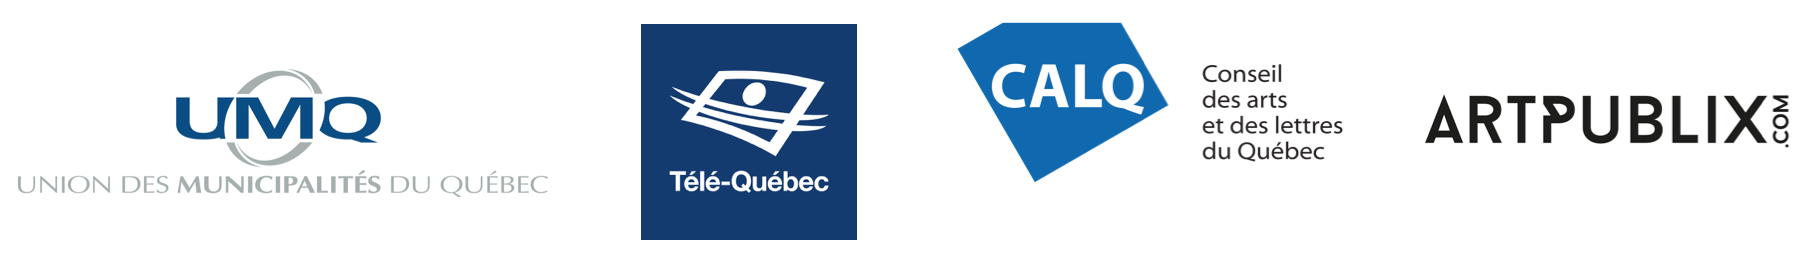 bloc-logos-partenaires-prix_1ligne